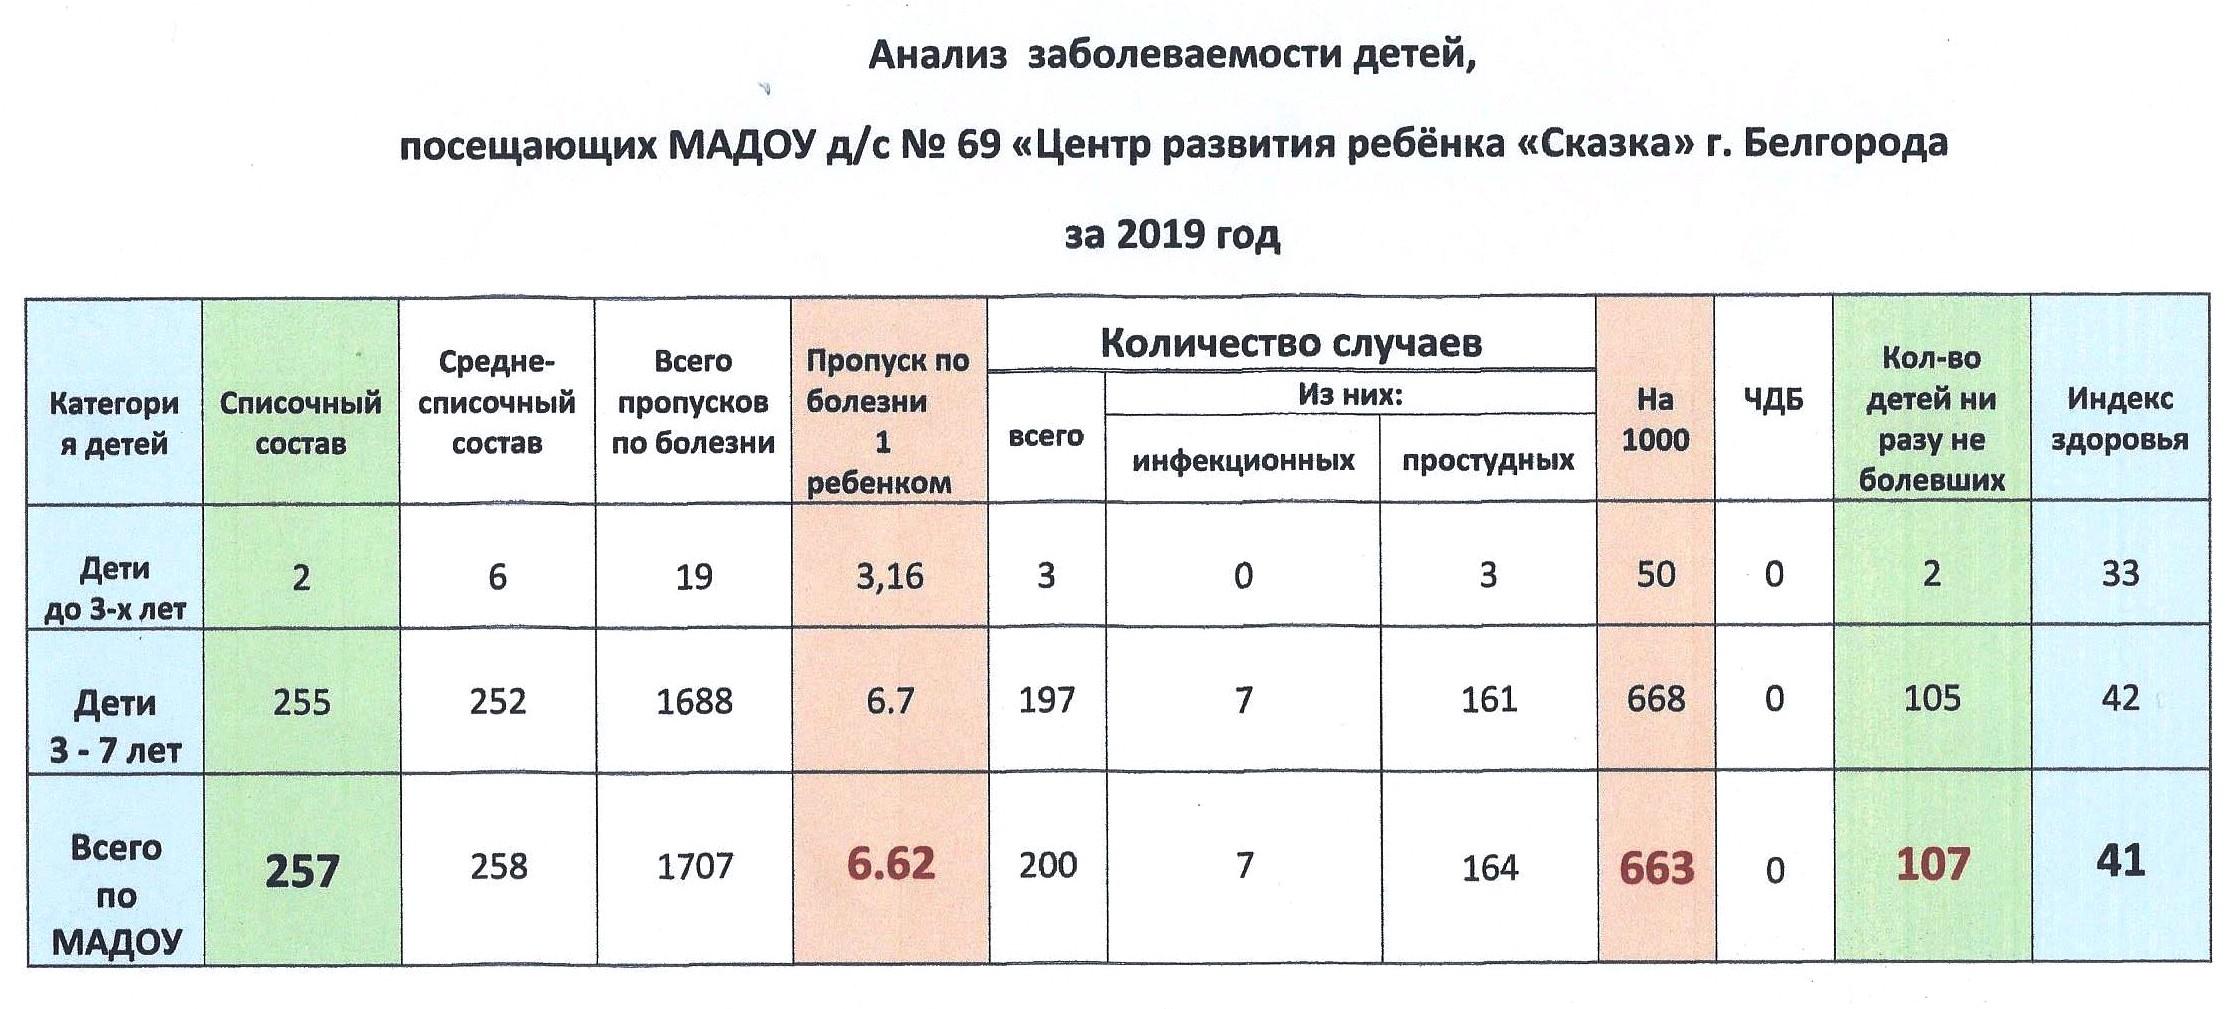 2. Анализ заболеваемости-2019